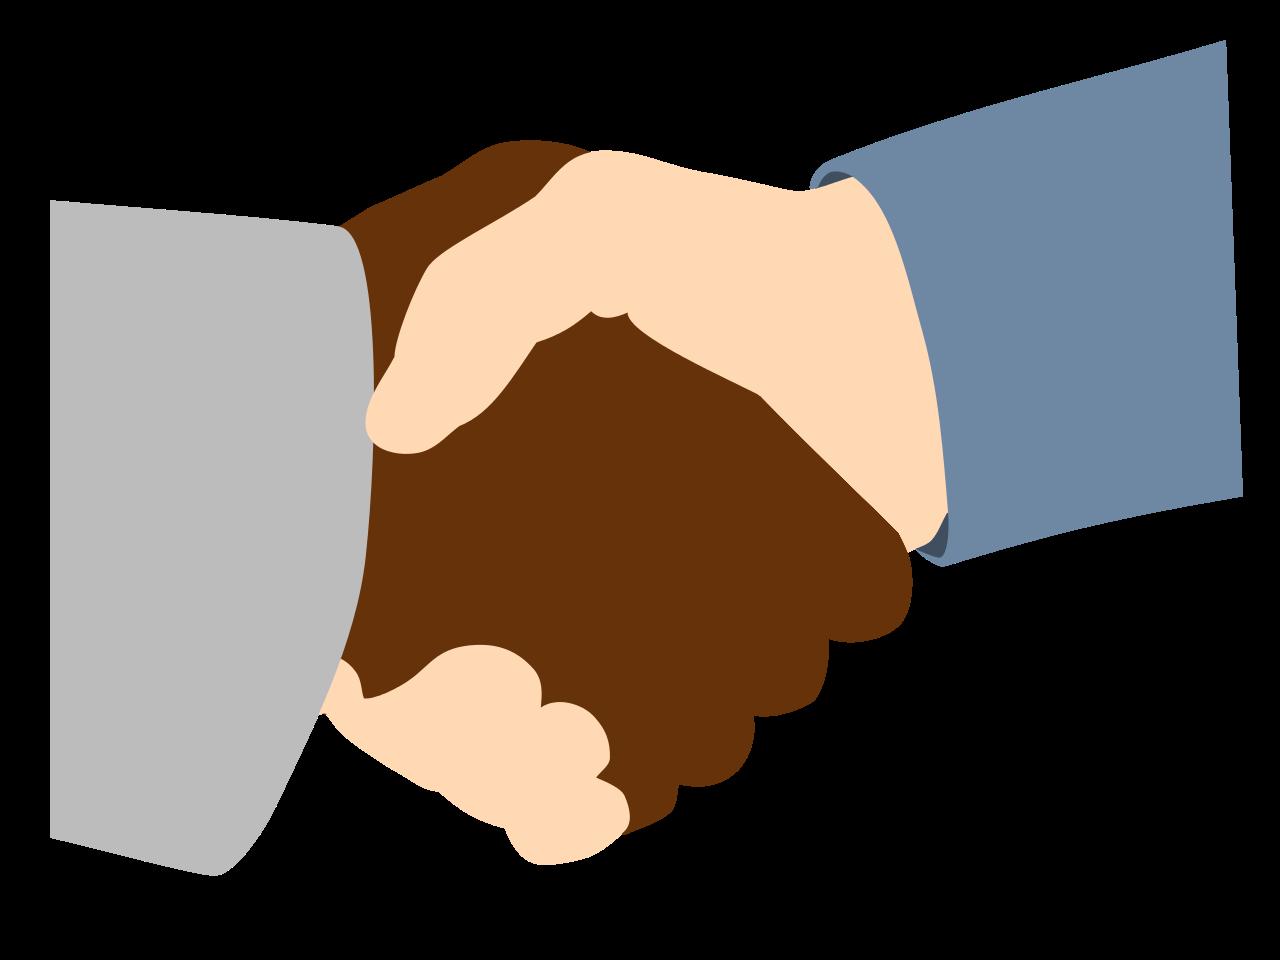 clipart stock File wikipedia filehandshakesvg. Handshake clipart svg